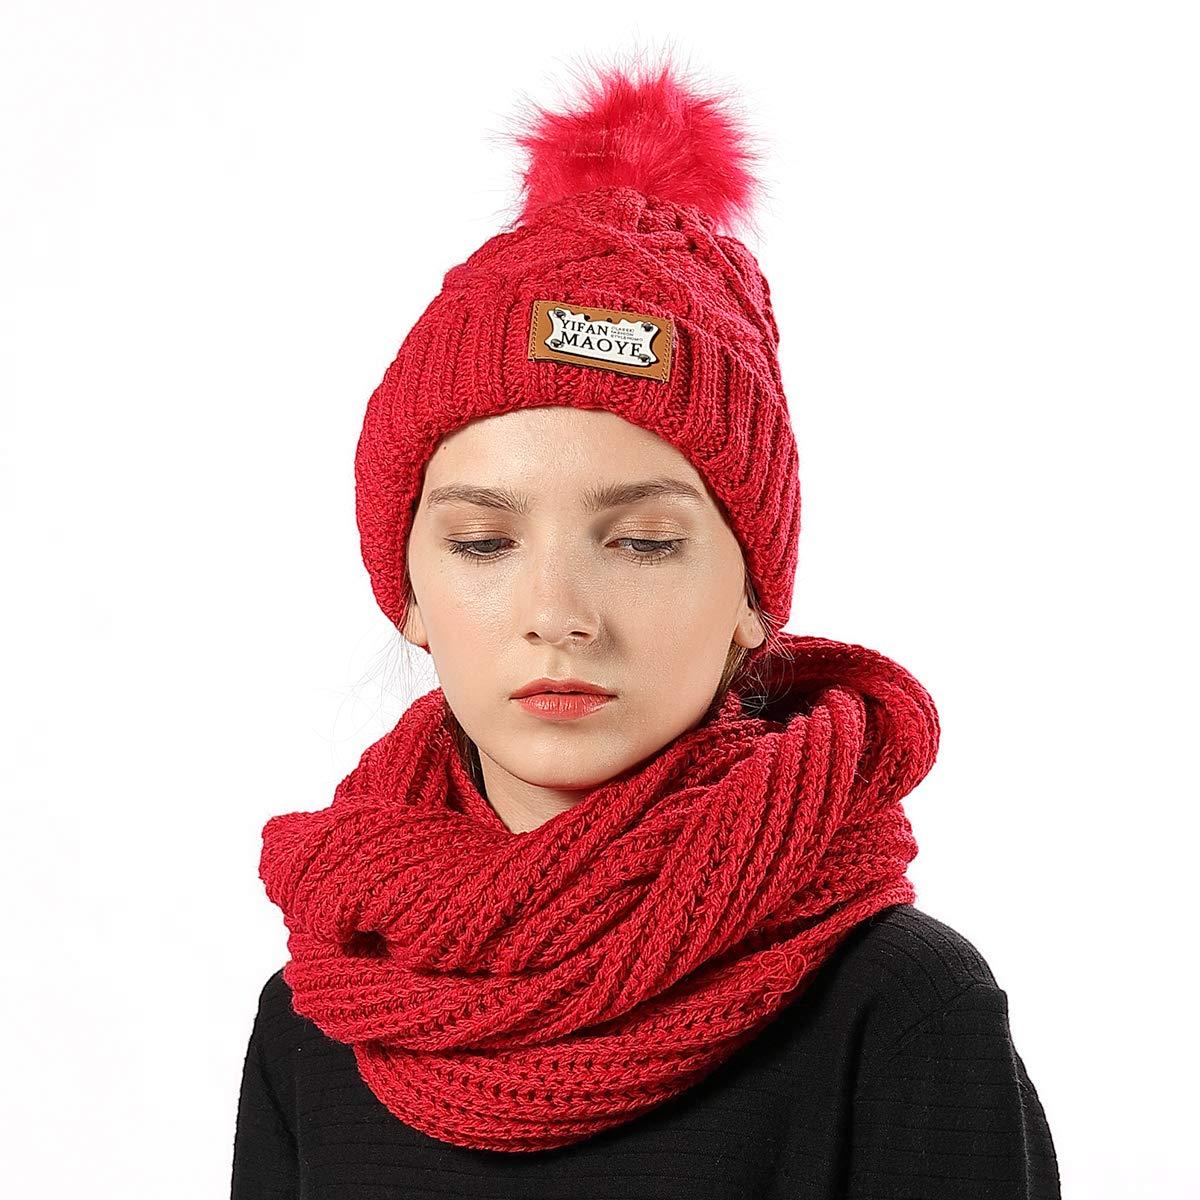 Knit Beanie Scarf Set Womens Fuzzy Lined Pom Pom Beanies Scarves for Winter Outdoors